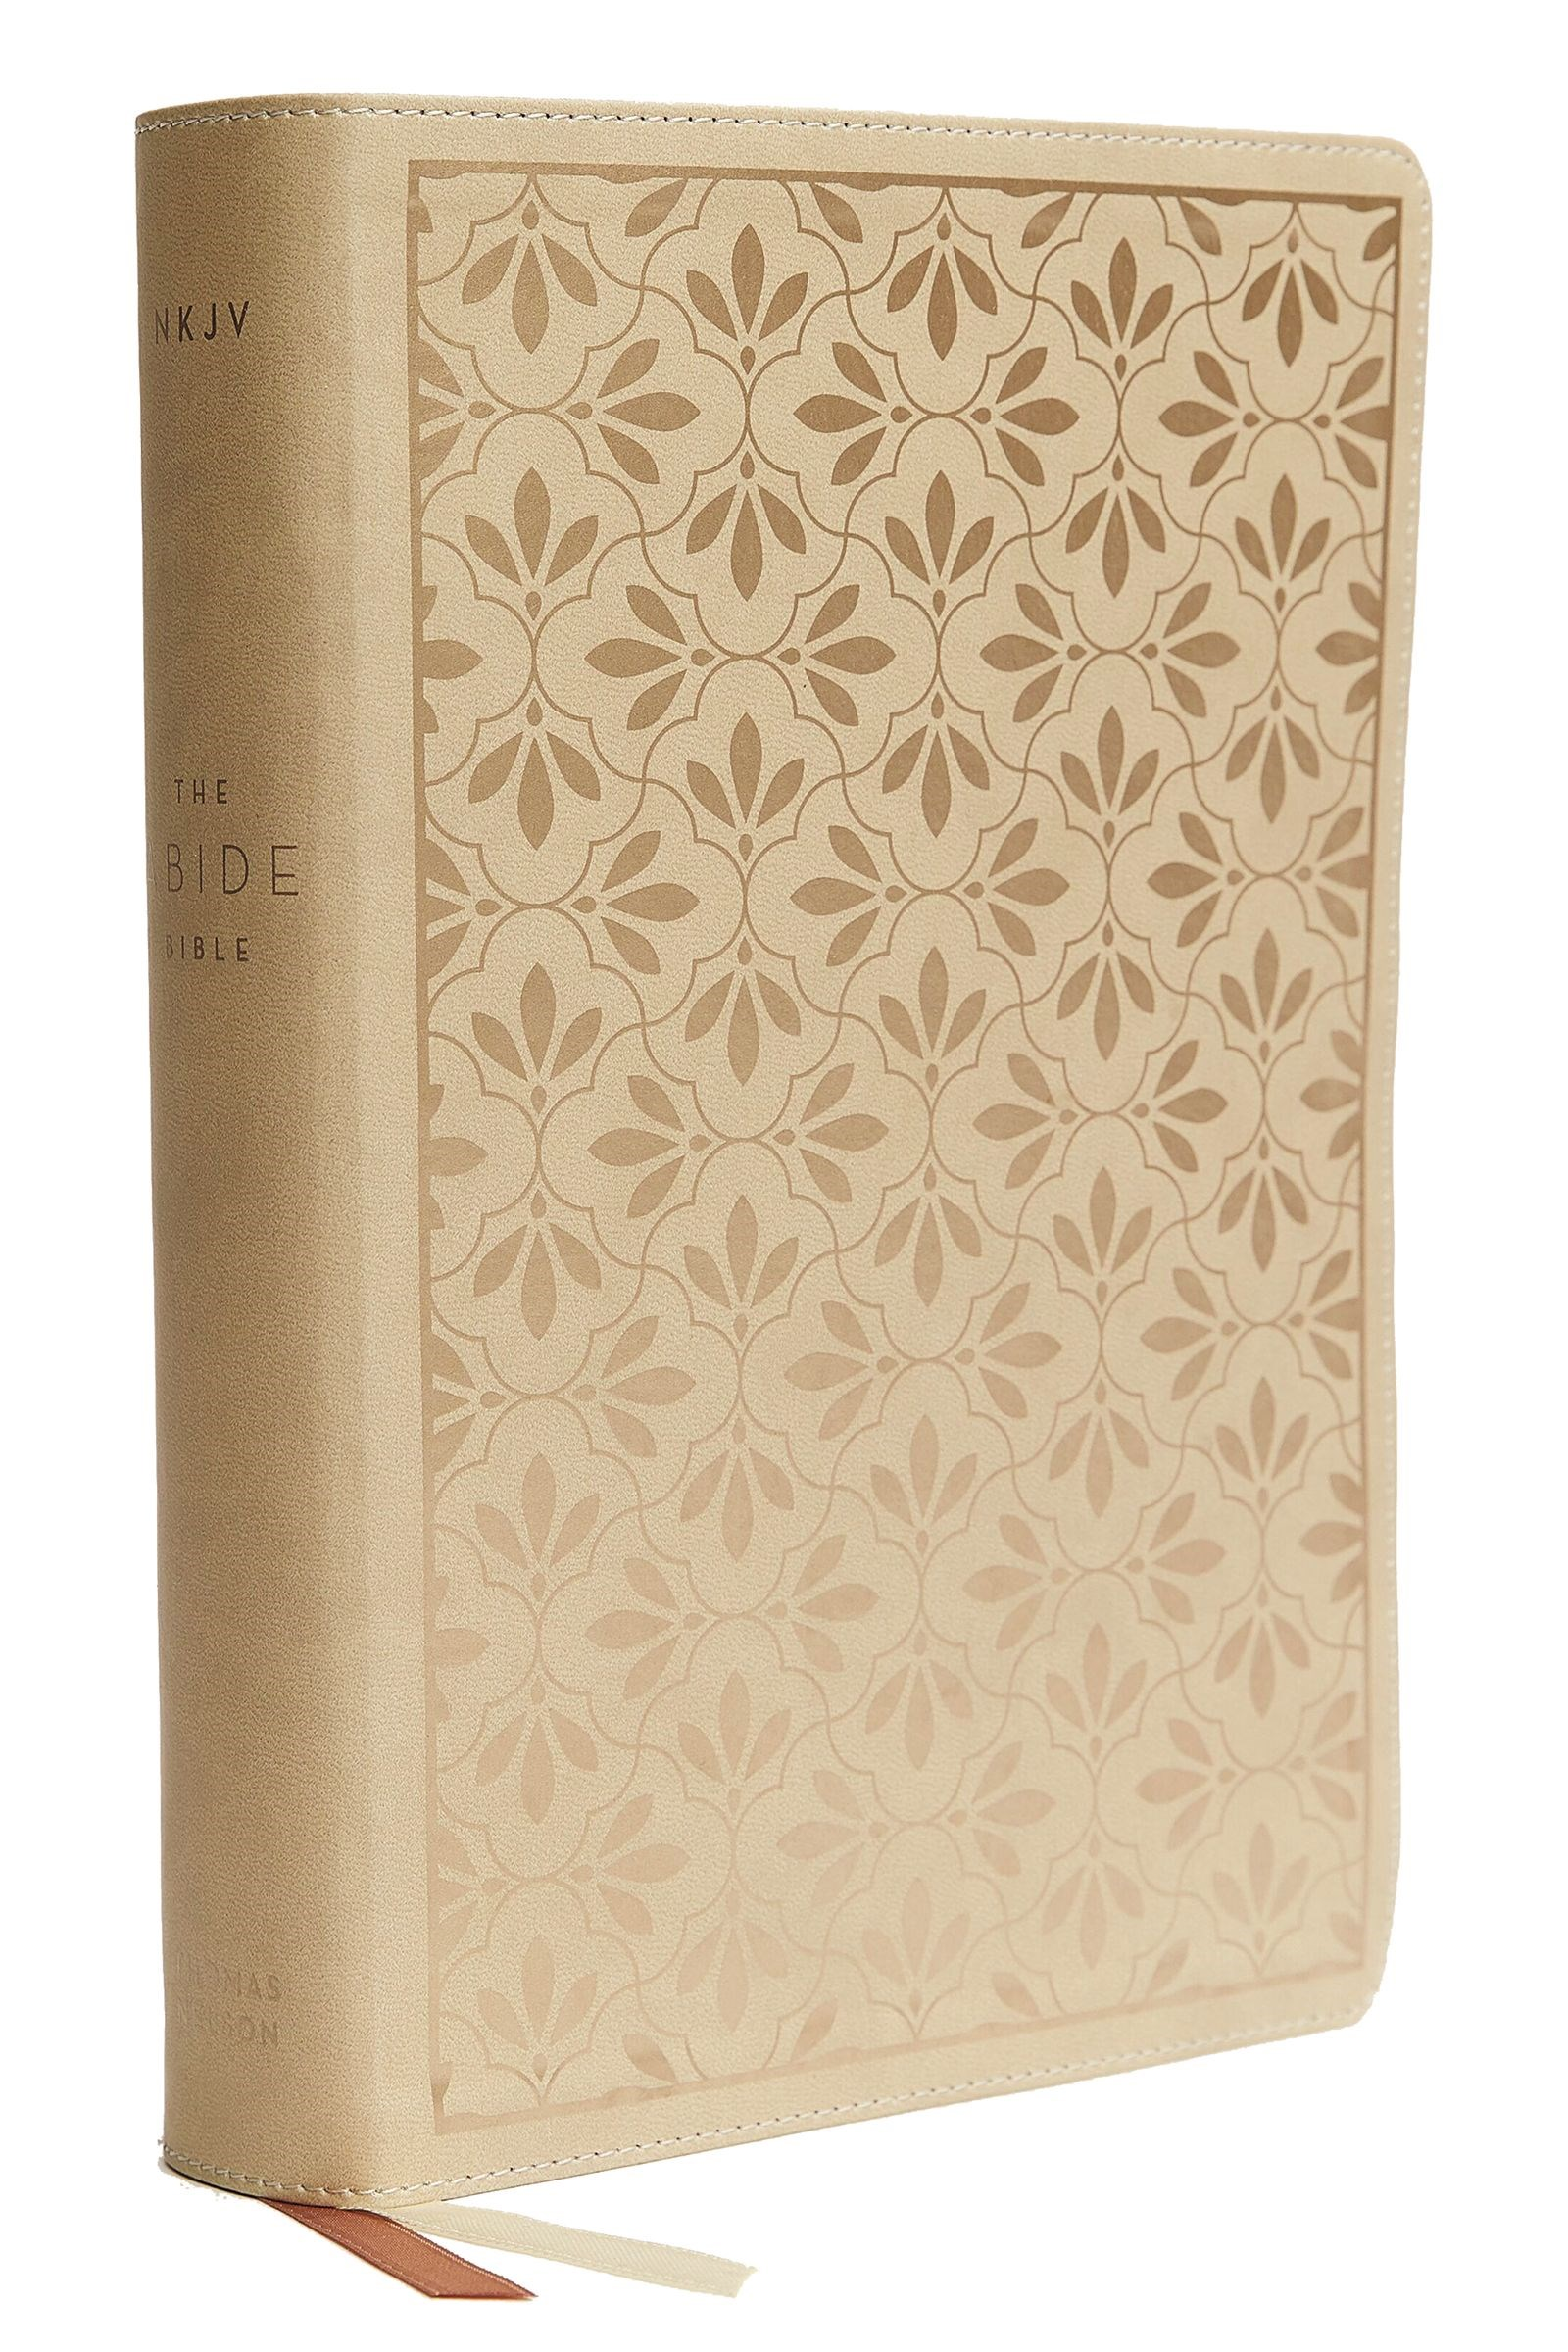 NKJV Abide Bible (Comfort Print)-Stone Leathersoft